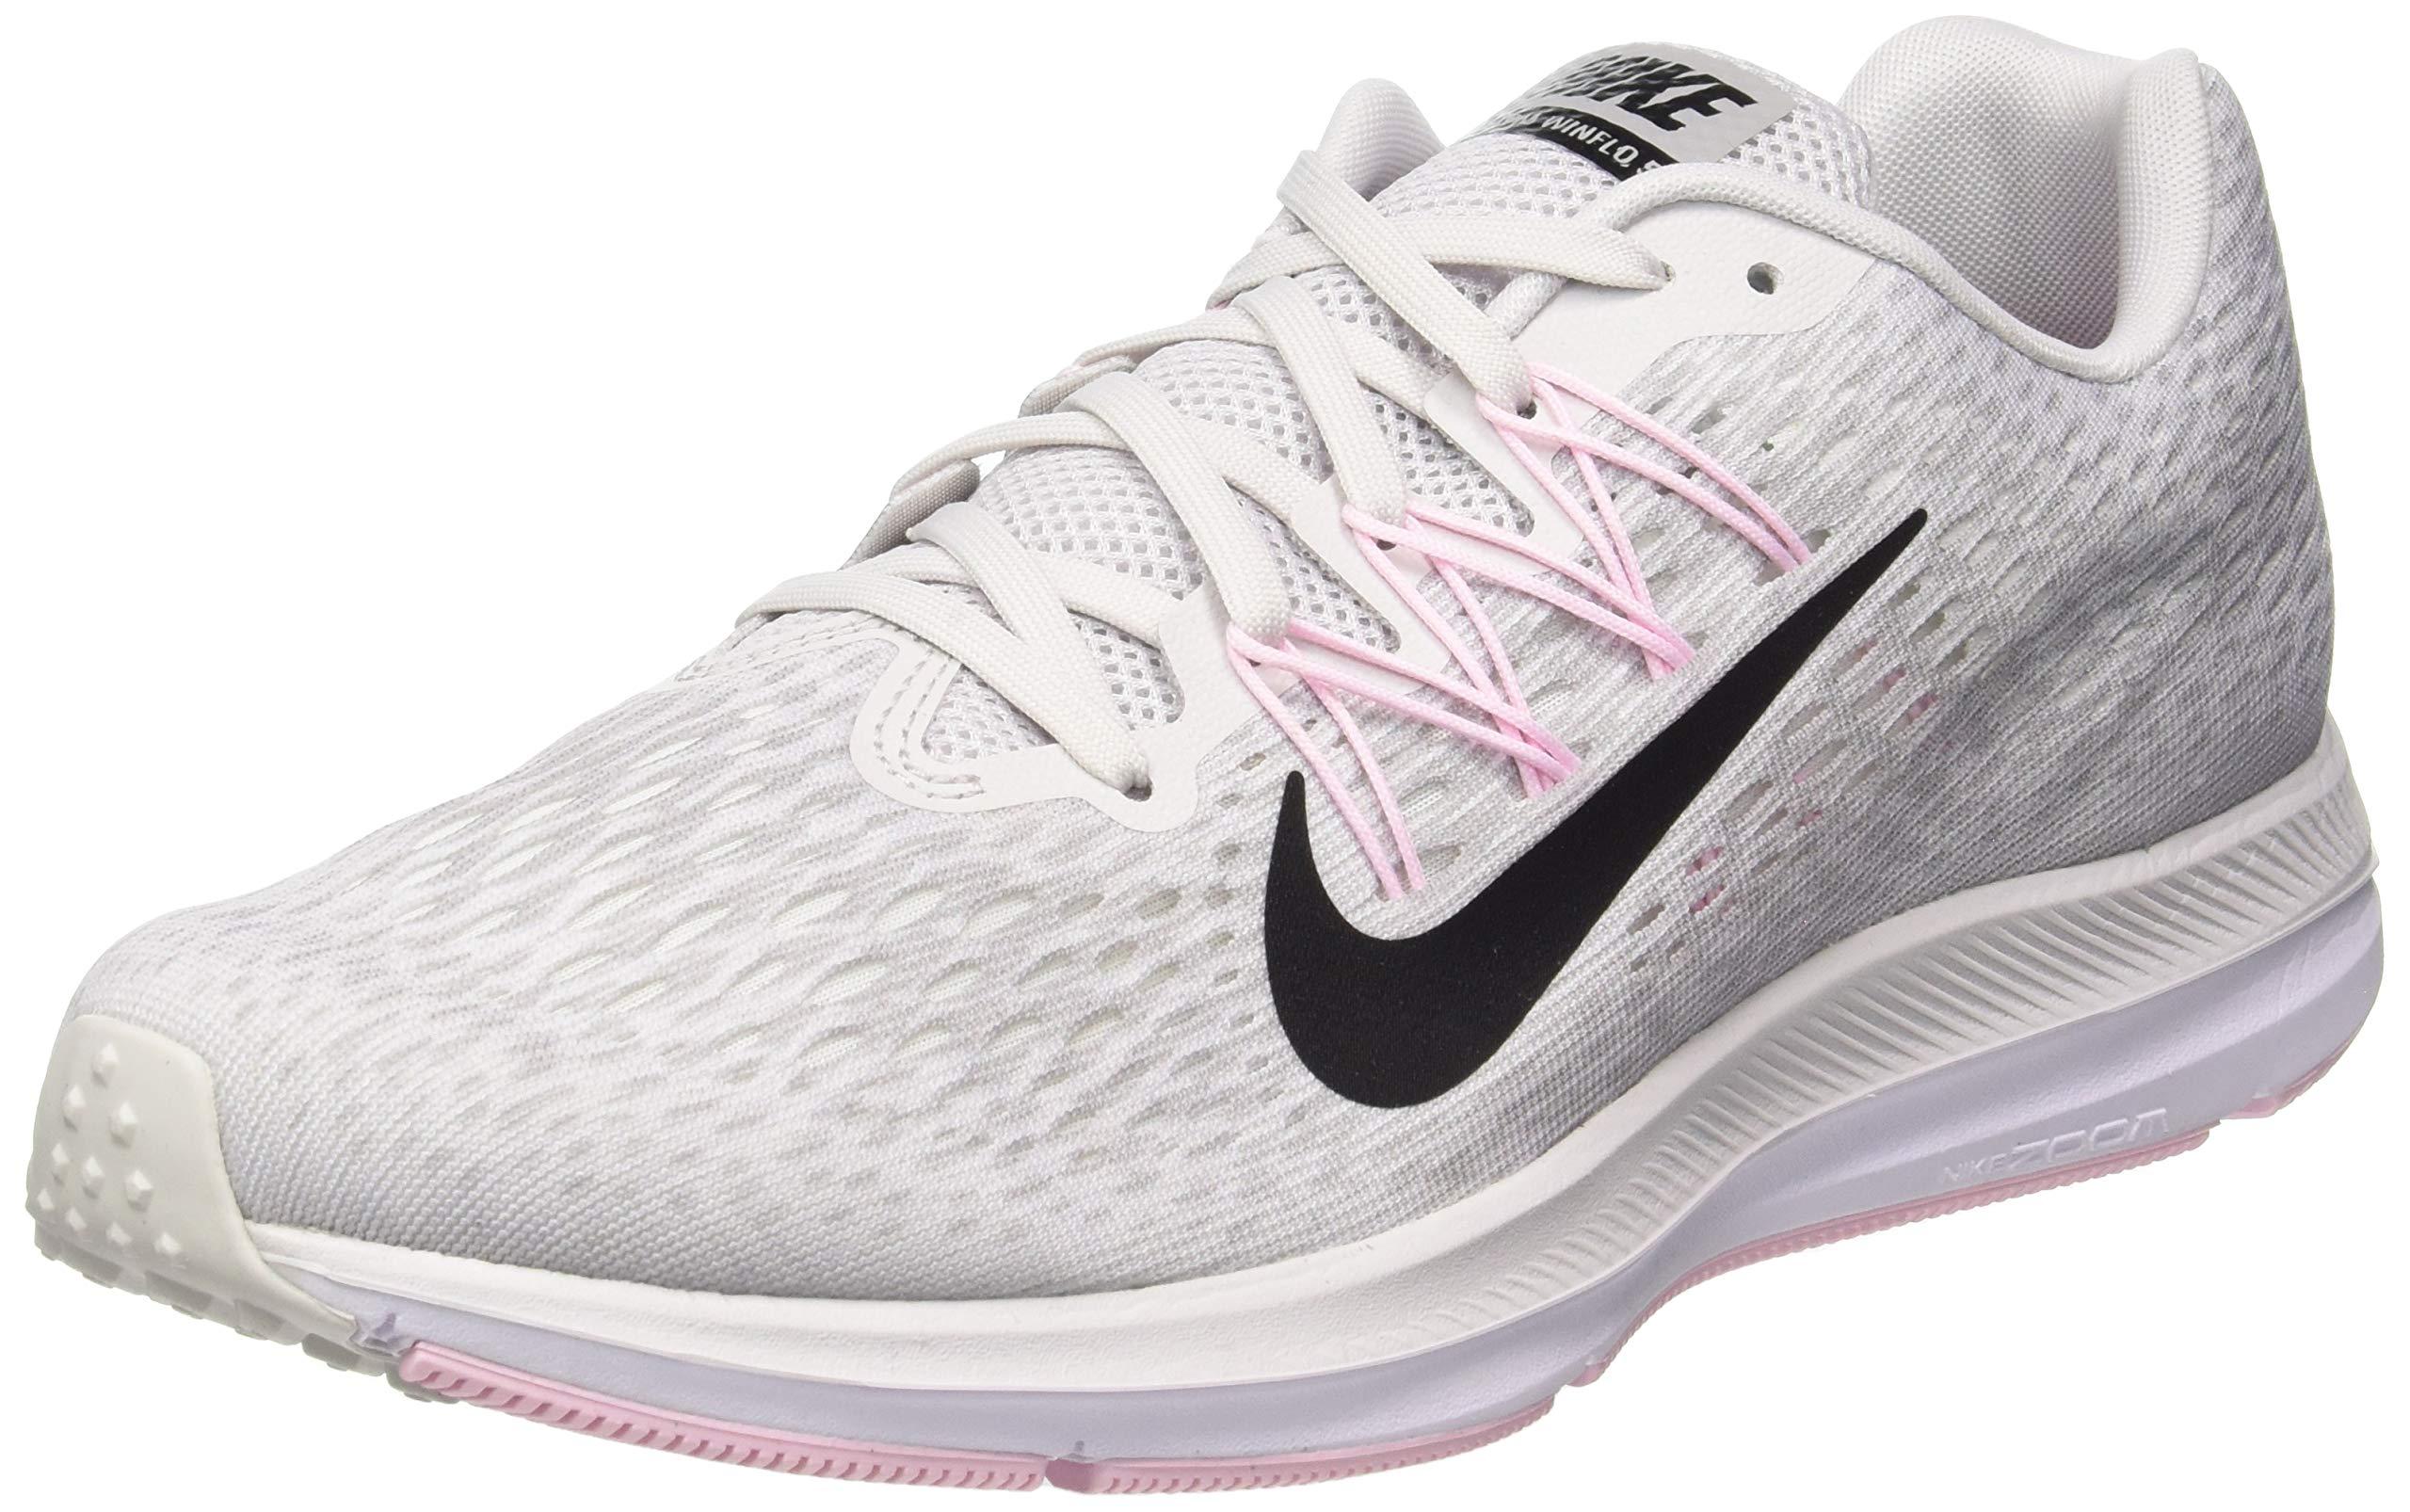 Nike Damen WMNS Zoom Winflo 5 Leichtathletikschuhe, grau